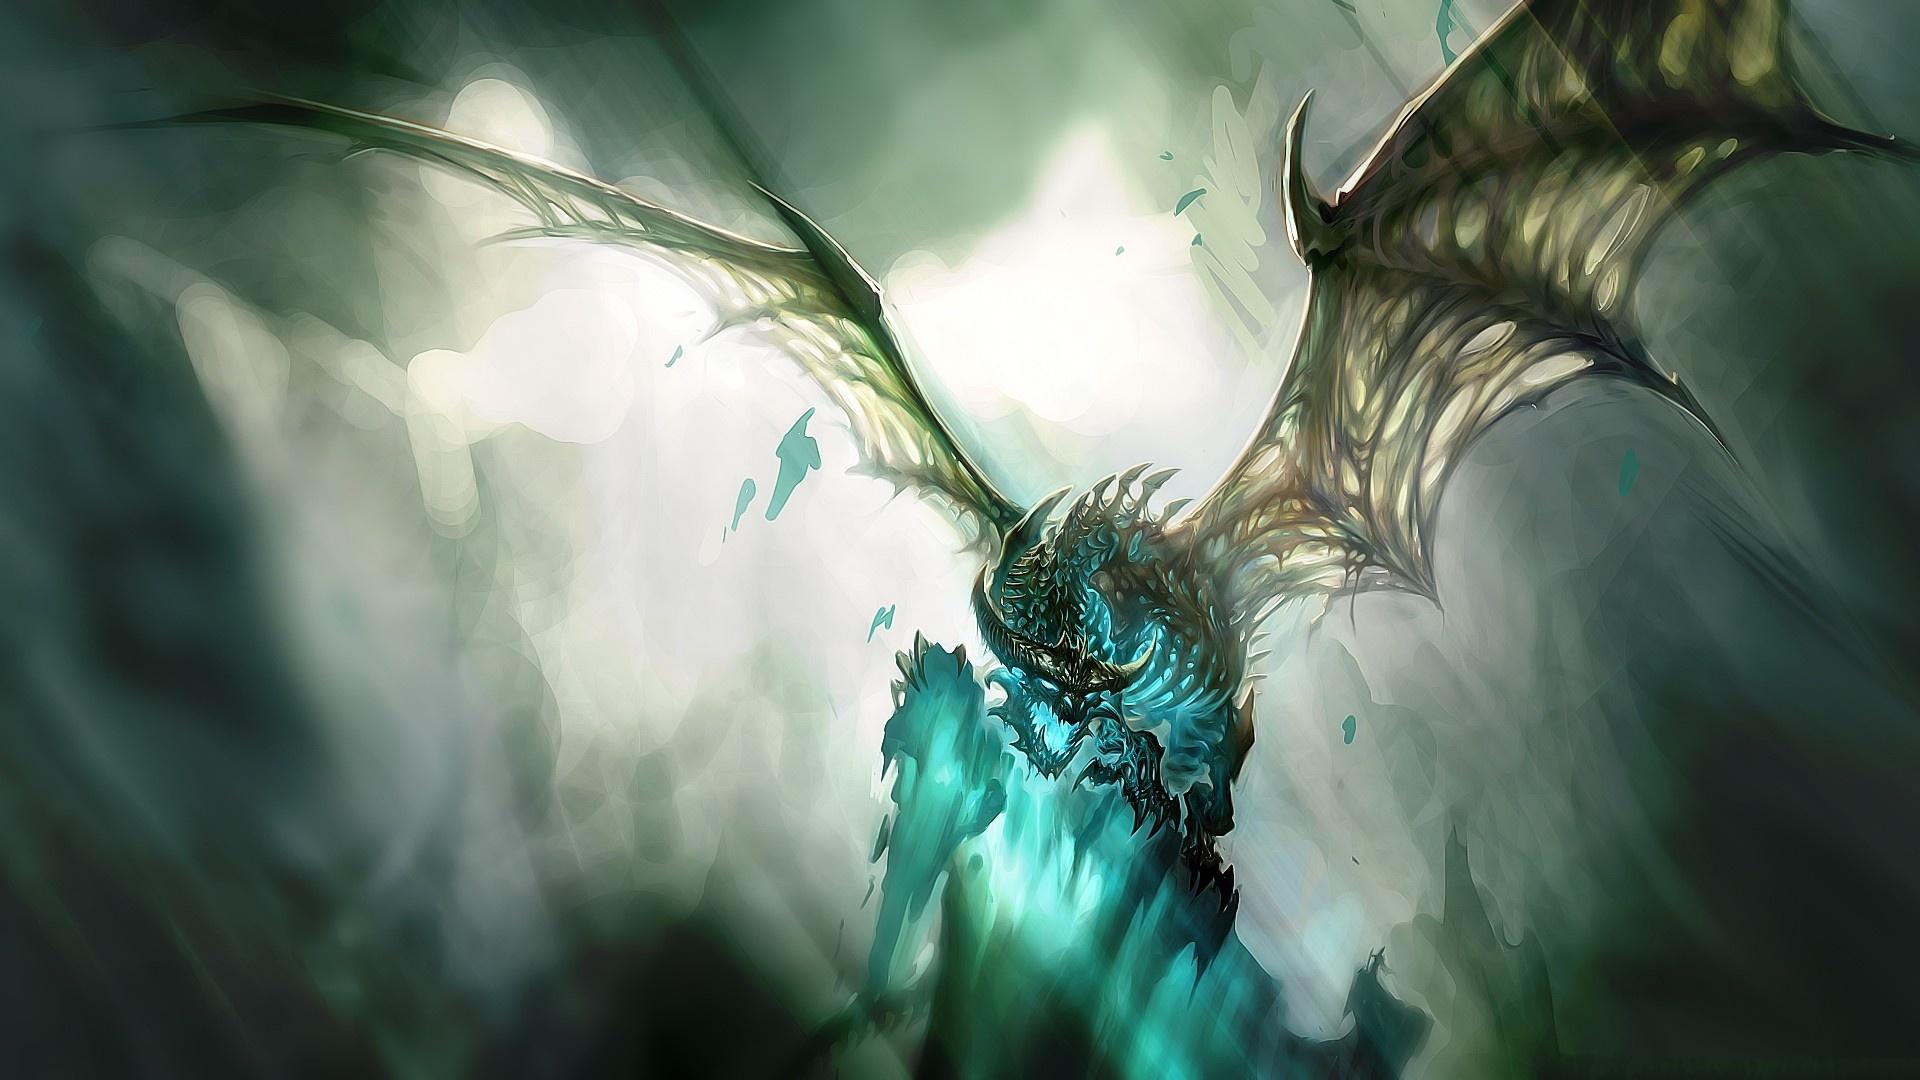 HD Ice Dragon Wallpapers 1920x1080